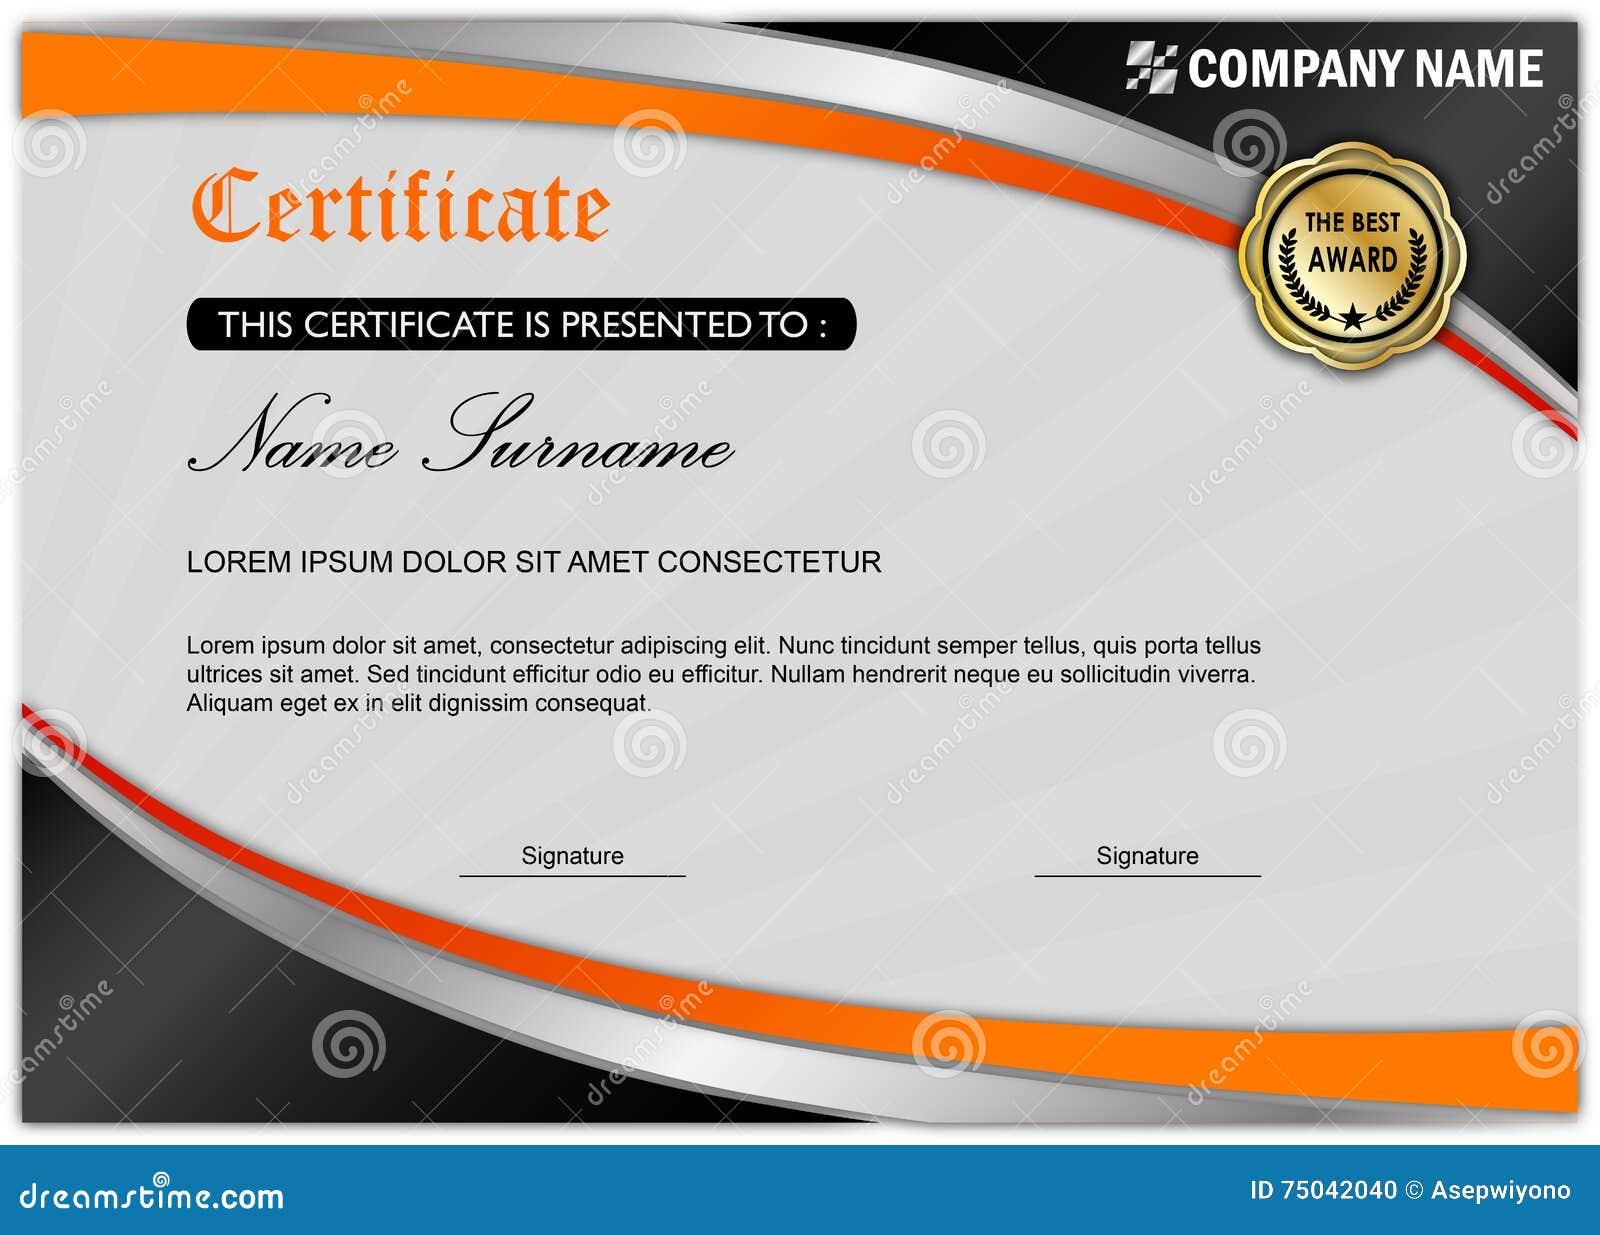 Moderne Zertifikat-/Diplom-Preis-Schablone, schwarze Orange